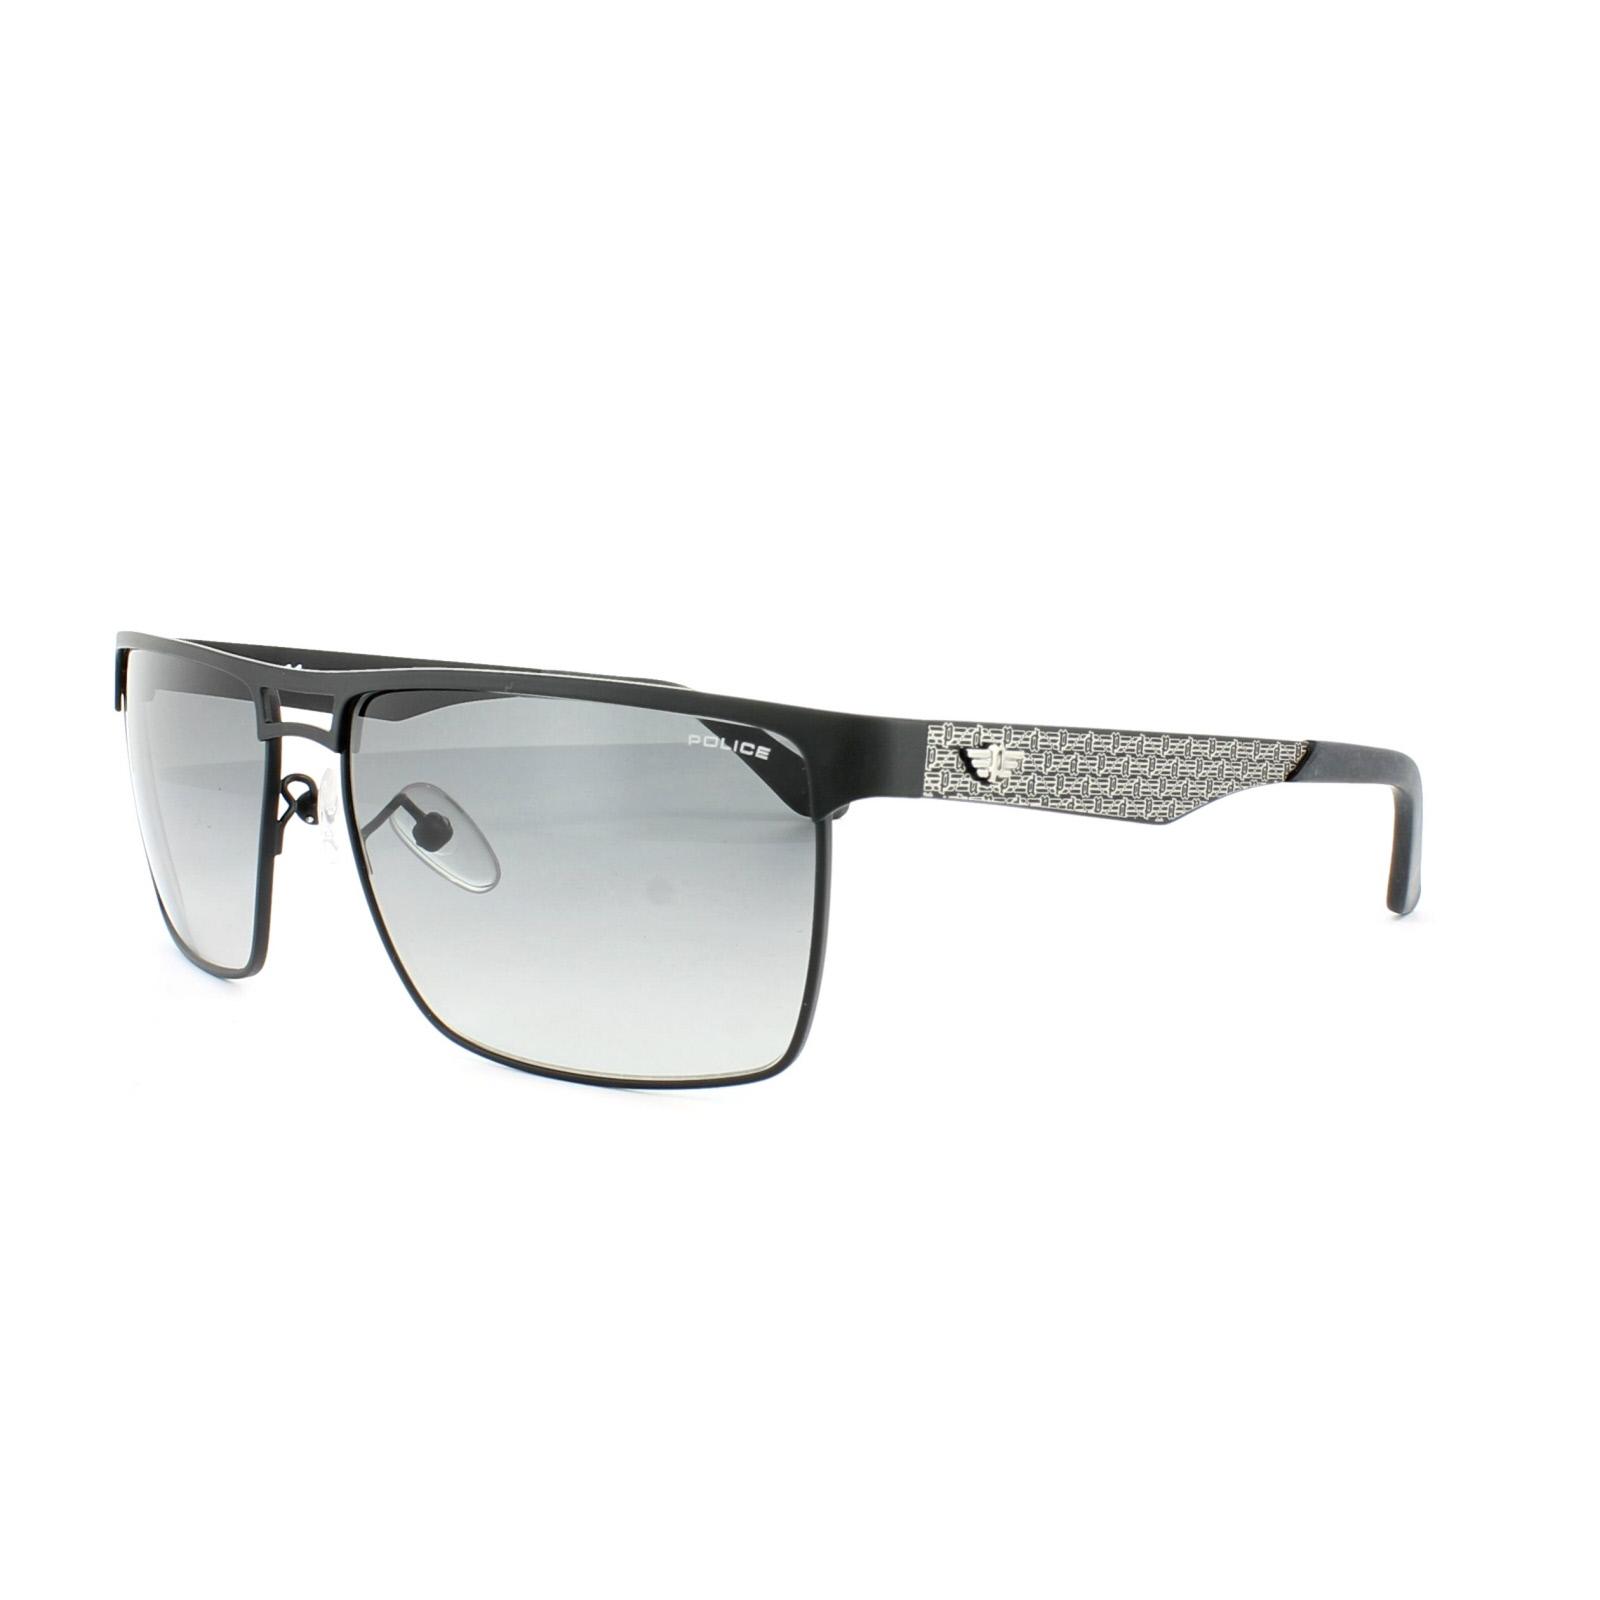 882cdf8321 Police Brand Sunglasses Review « Heritage Malta